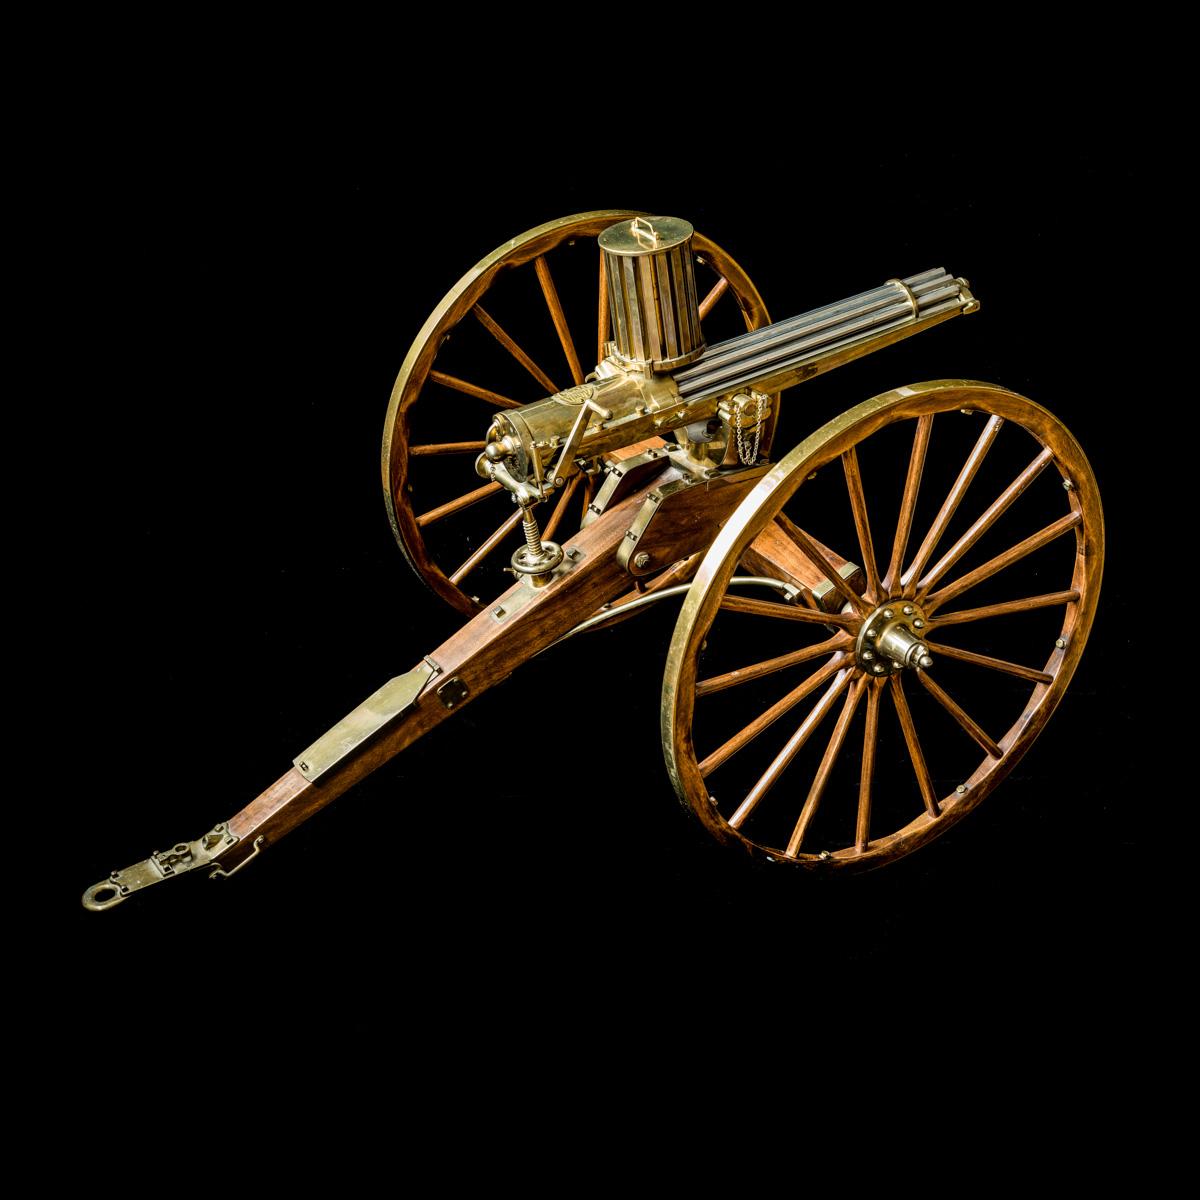 Gatling Gun 1-3rd size model-4